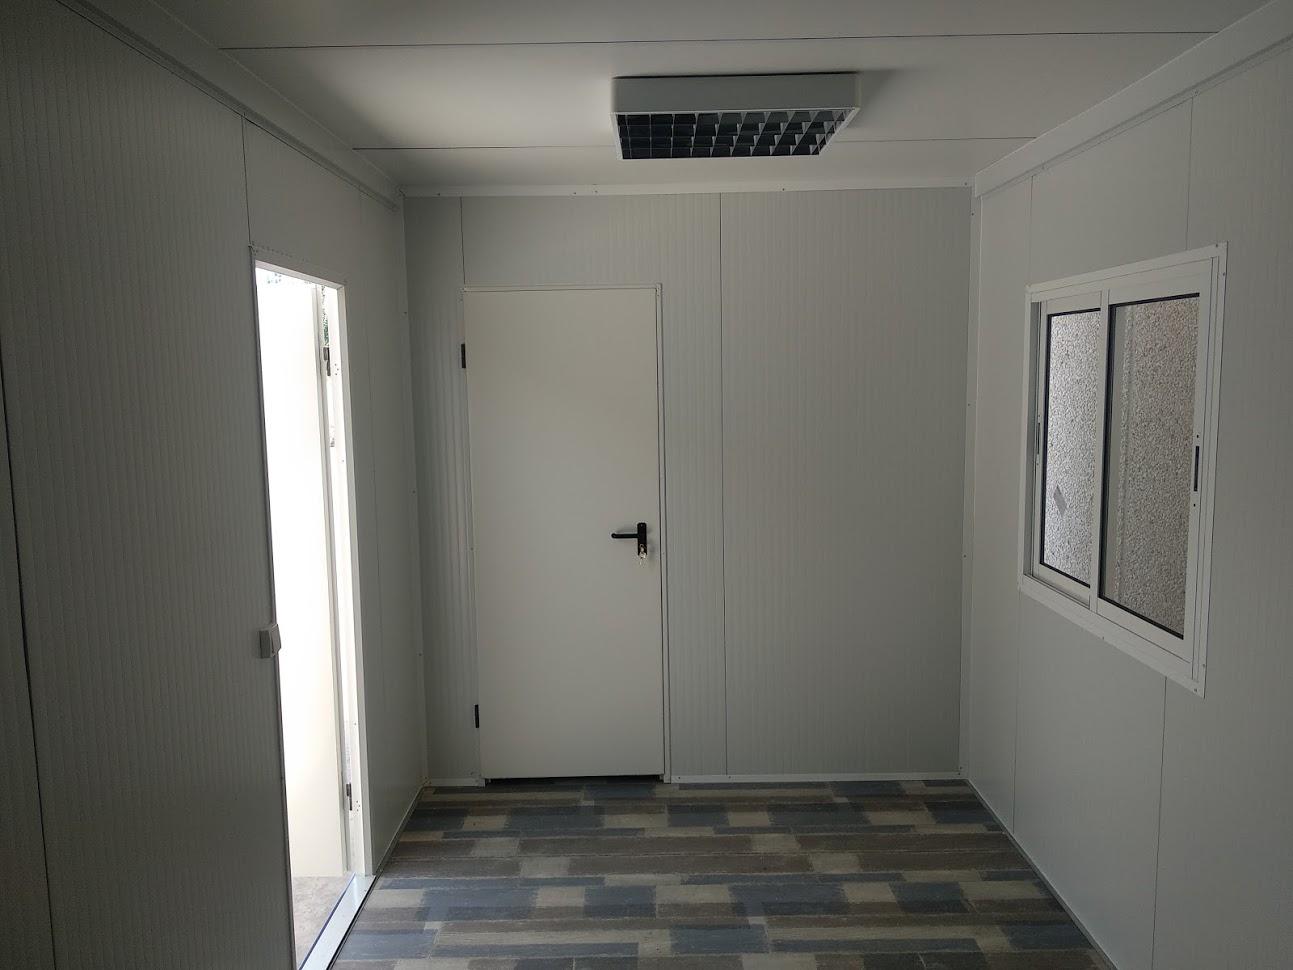 oficinas de obra prefabricadas en zaragoza